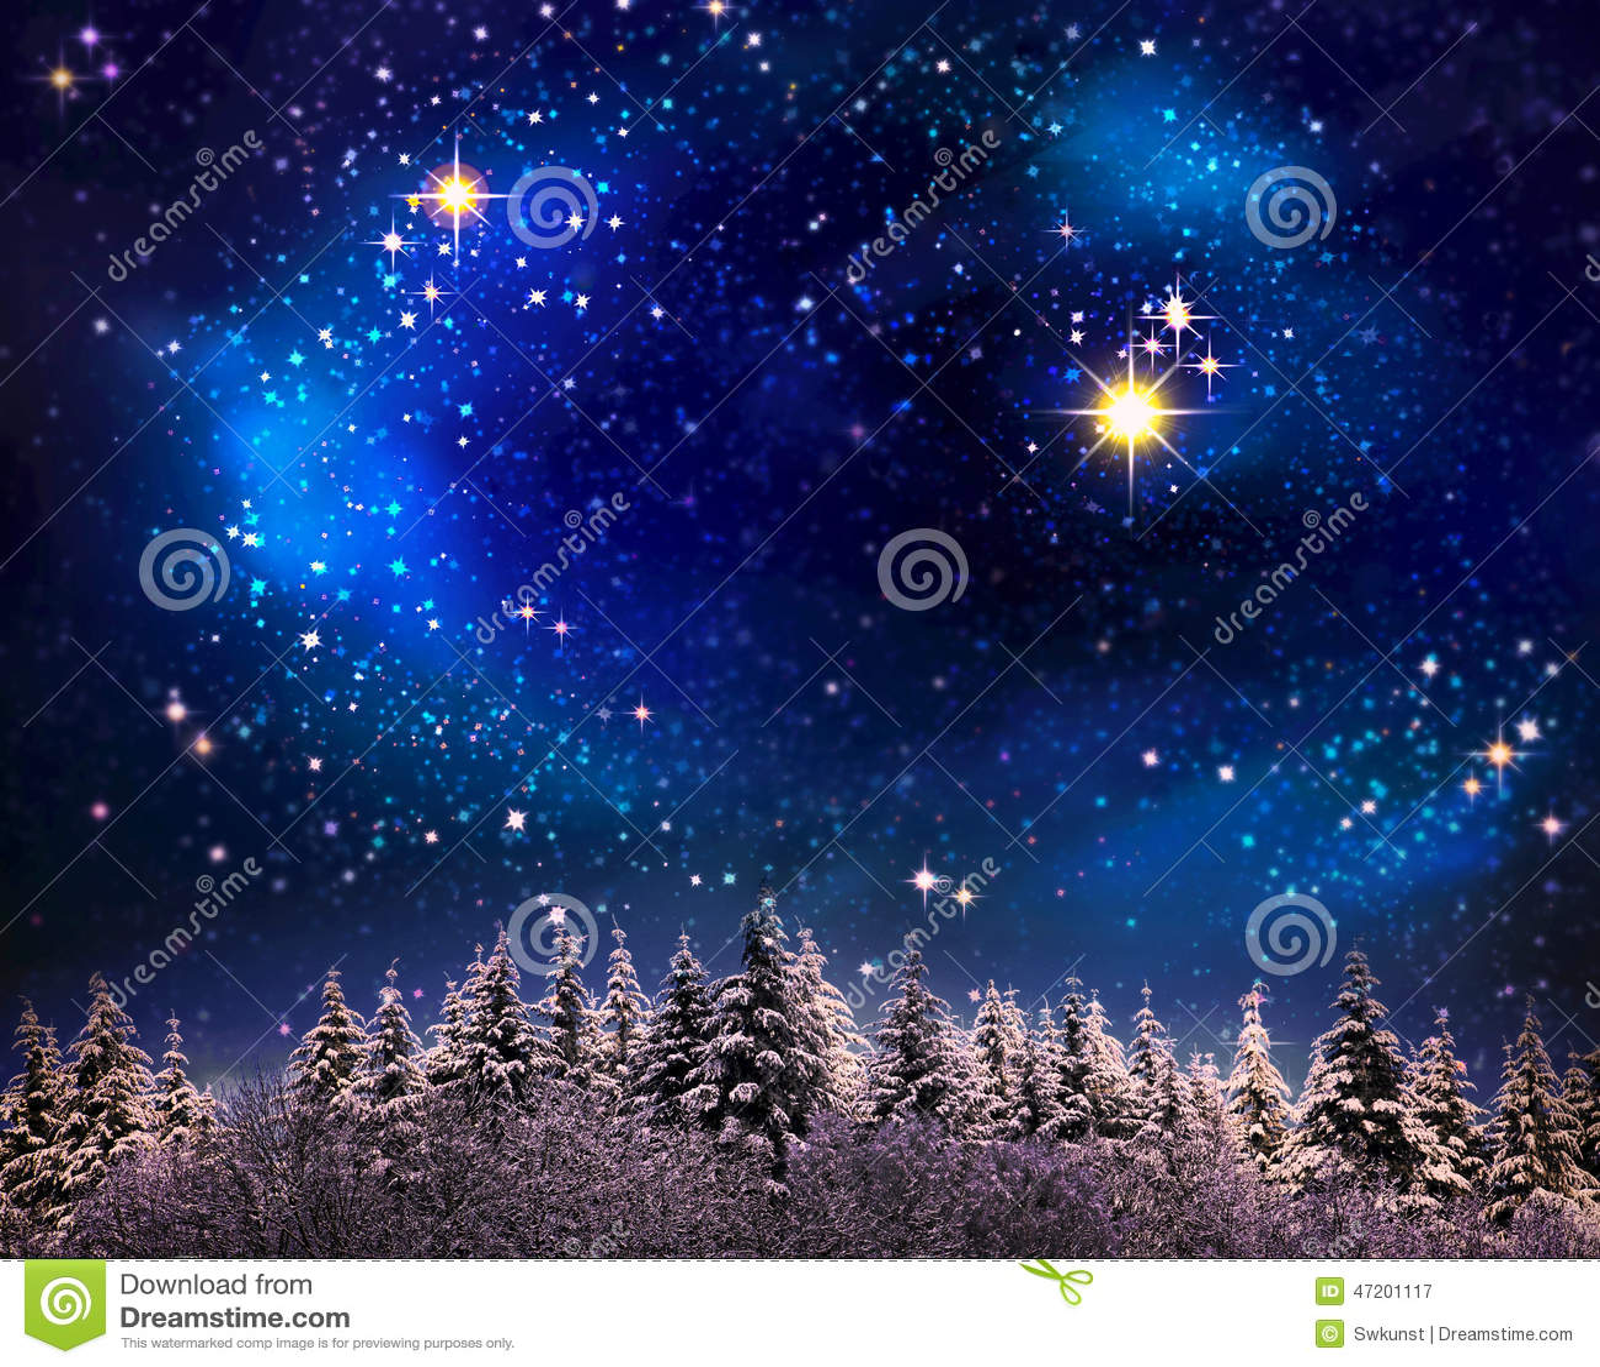 Christmas Night Sky Background. Stock Illustration - Image: 47201117